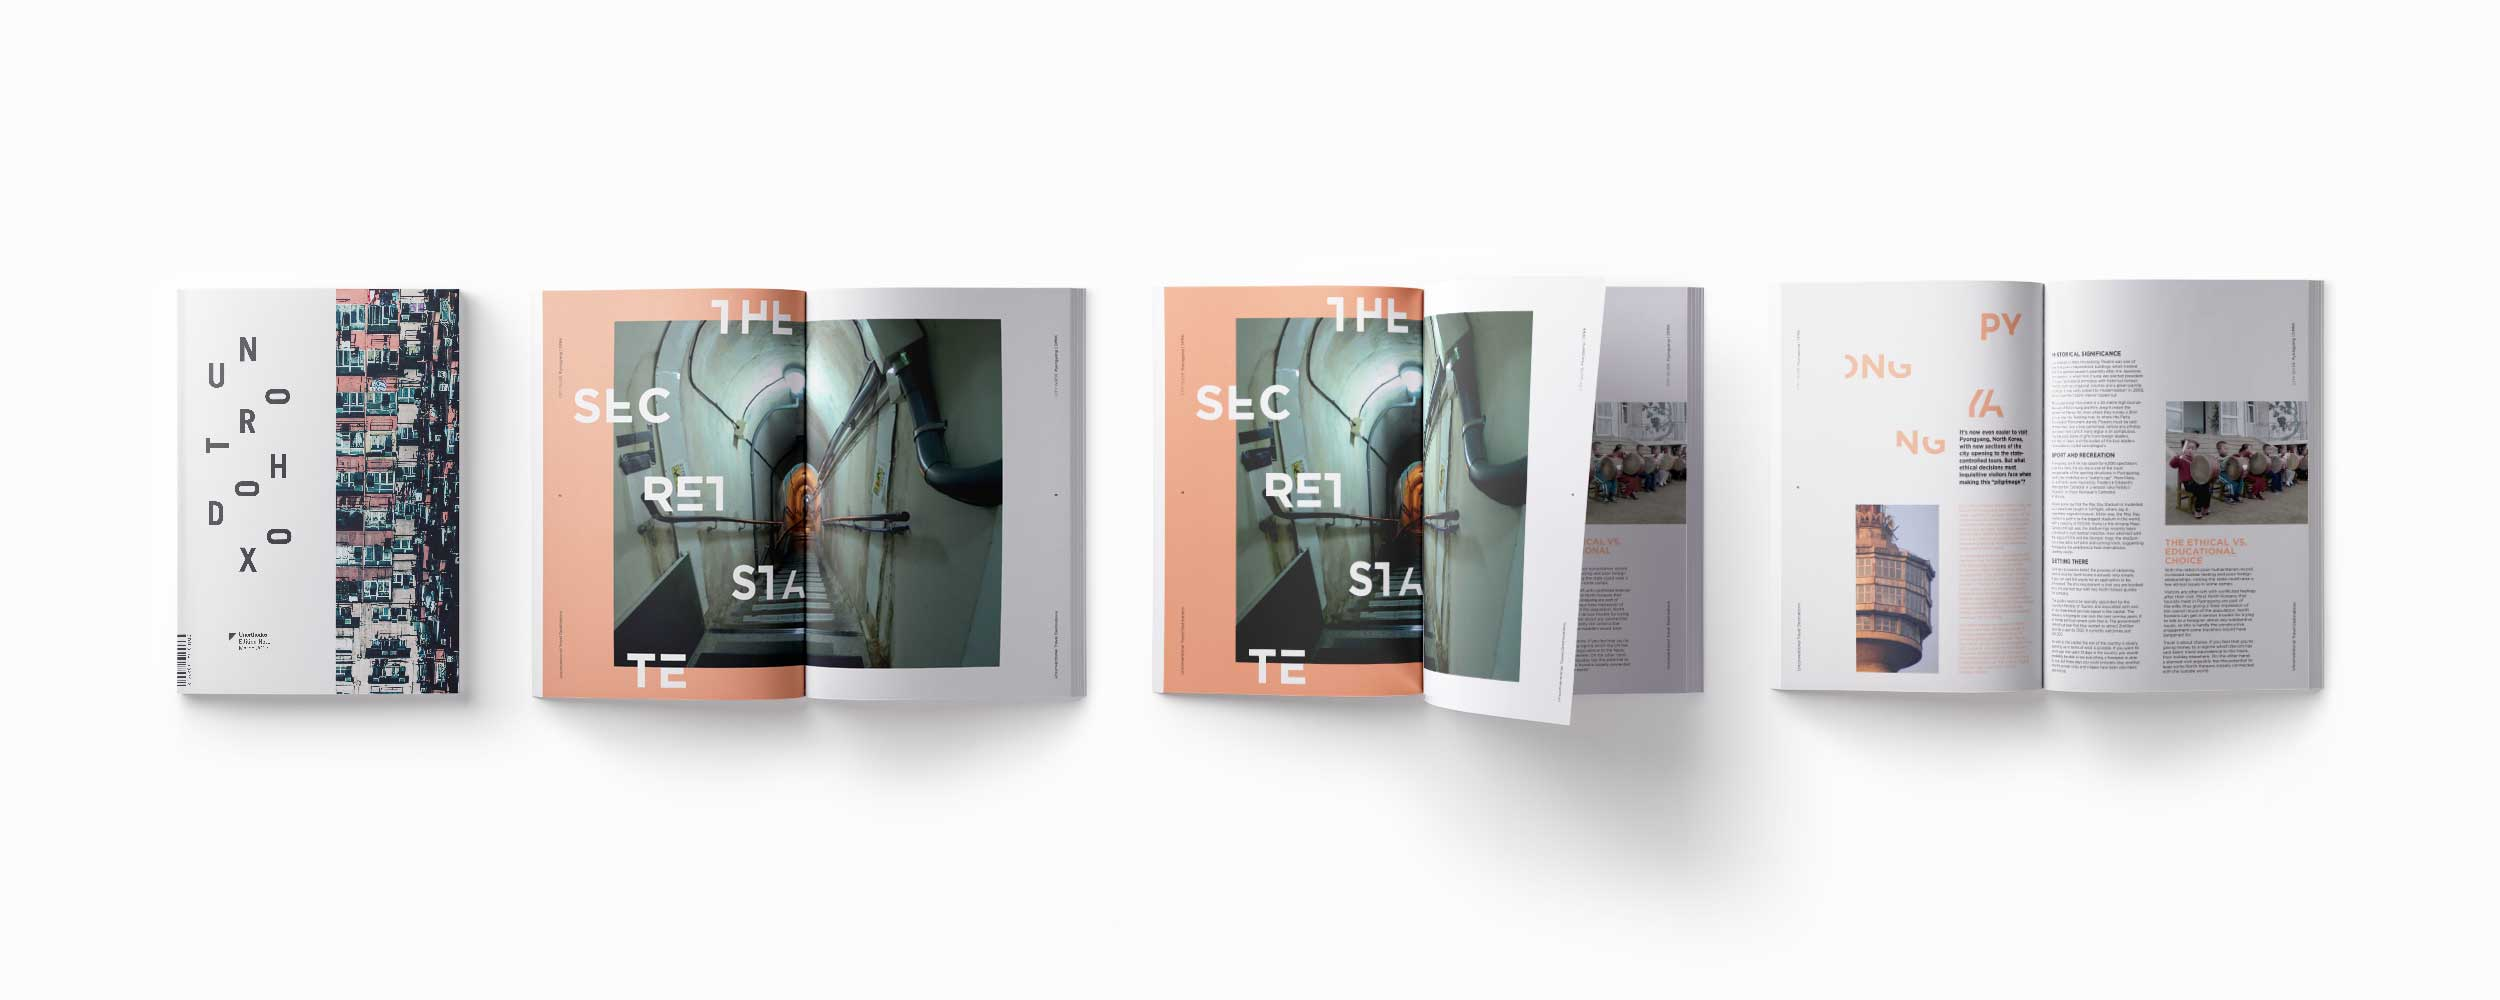 Travel-Magazine-Full-Page-Spreads-Designer.jpg